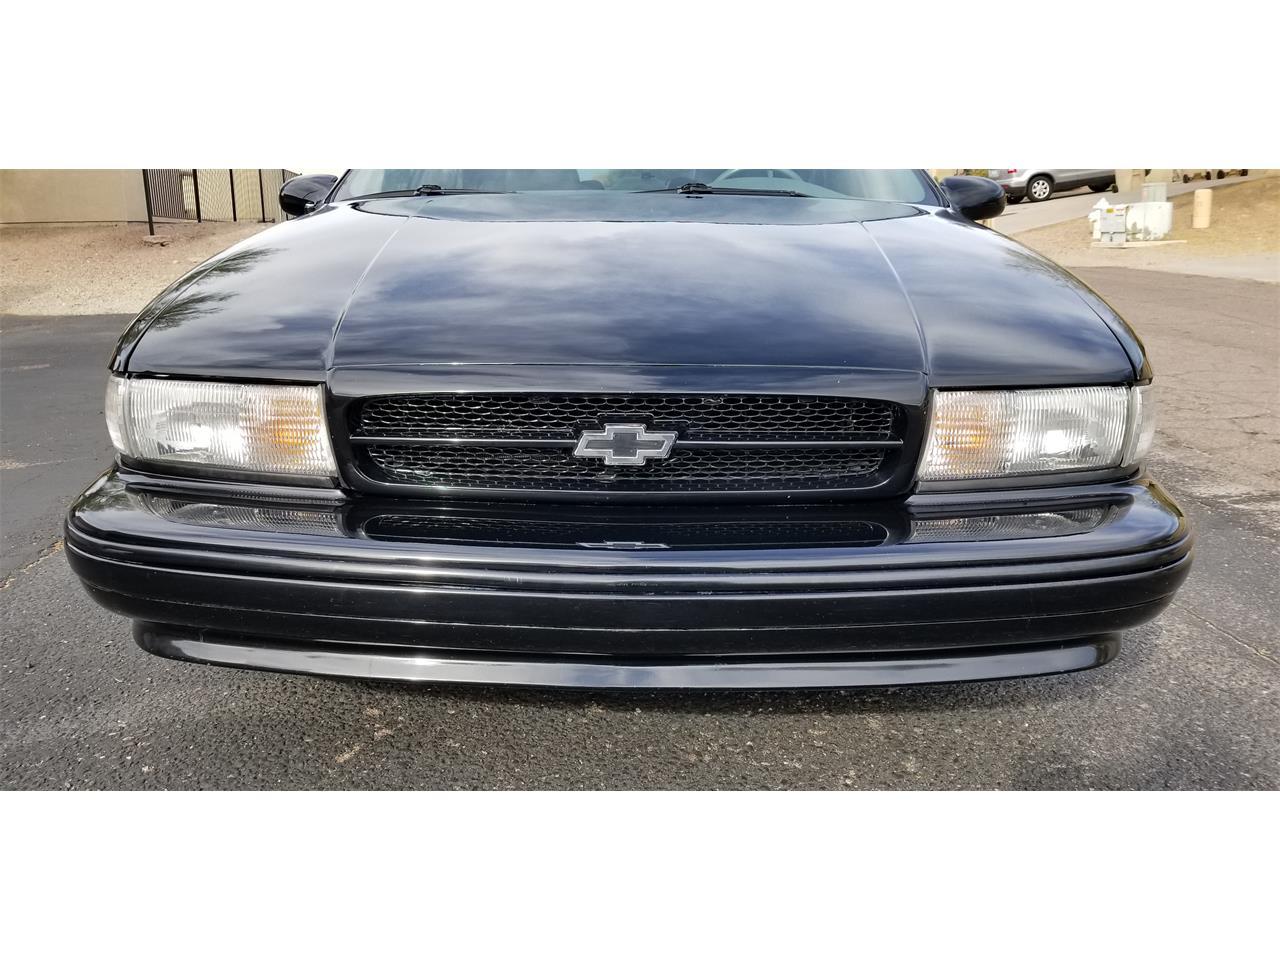 For Sale: 1996 Chevrolet Impala SS in Scottsdale, Arizona